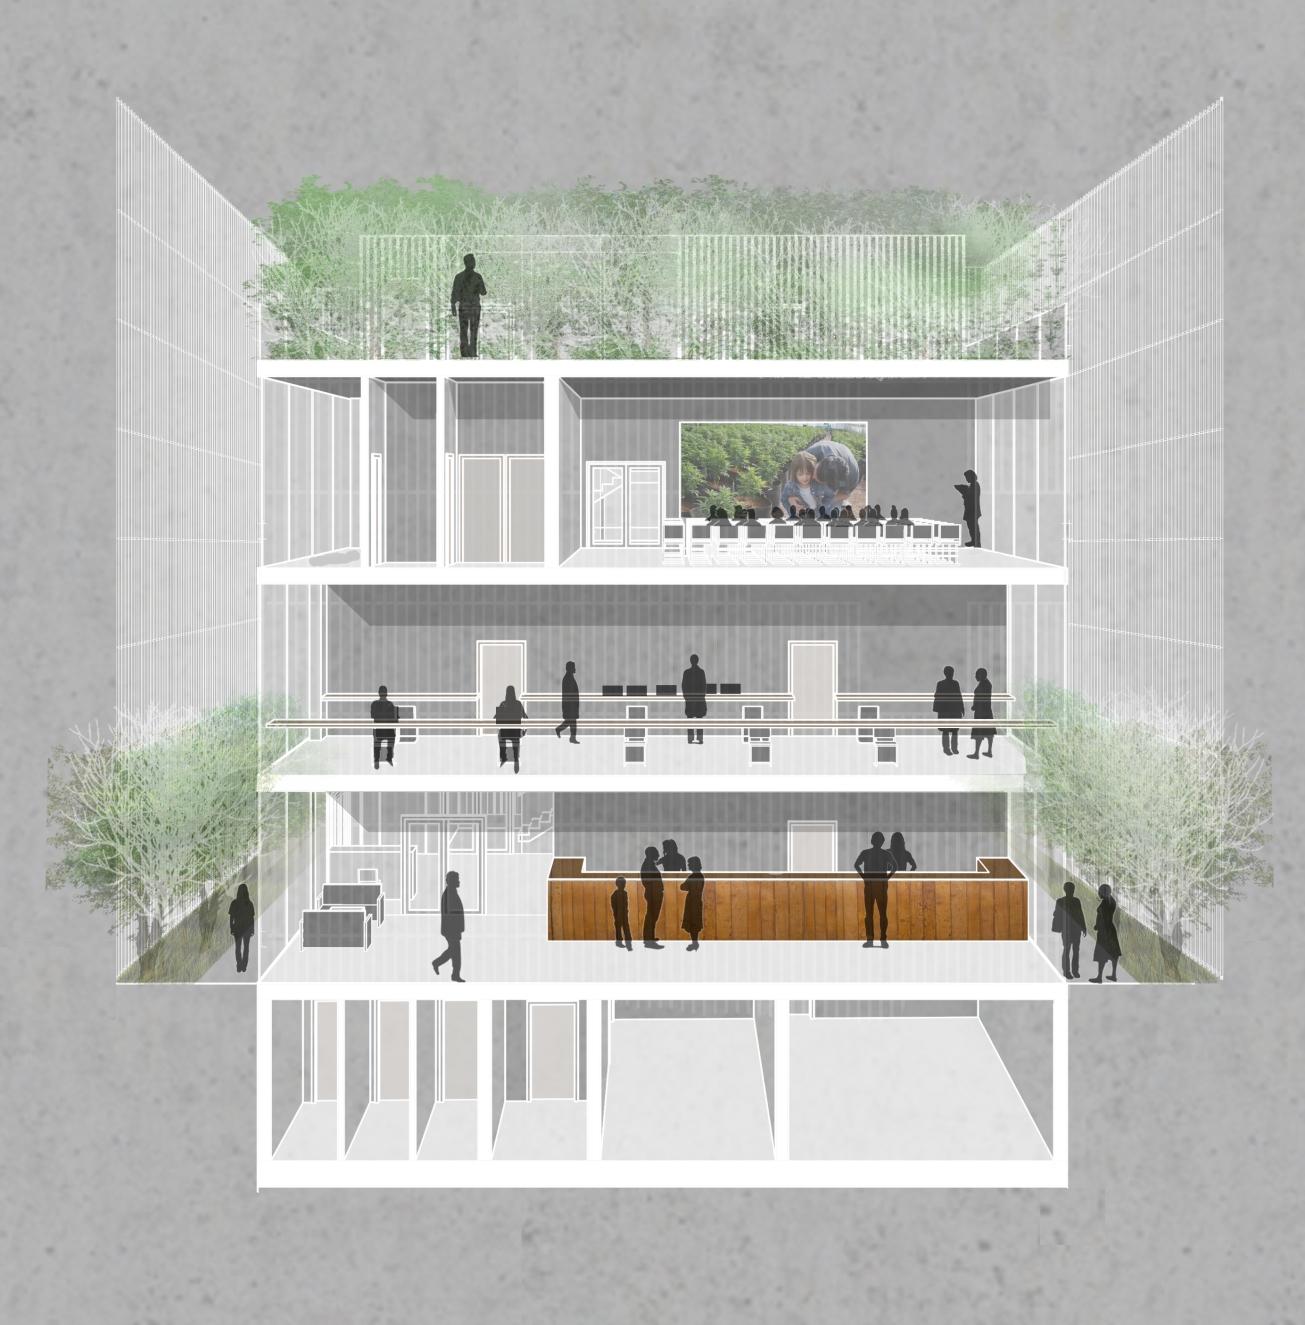 1_elzbieta-komendacka_wroclaw-univeristy-of-technology_architecture_master